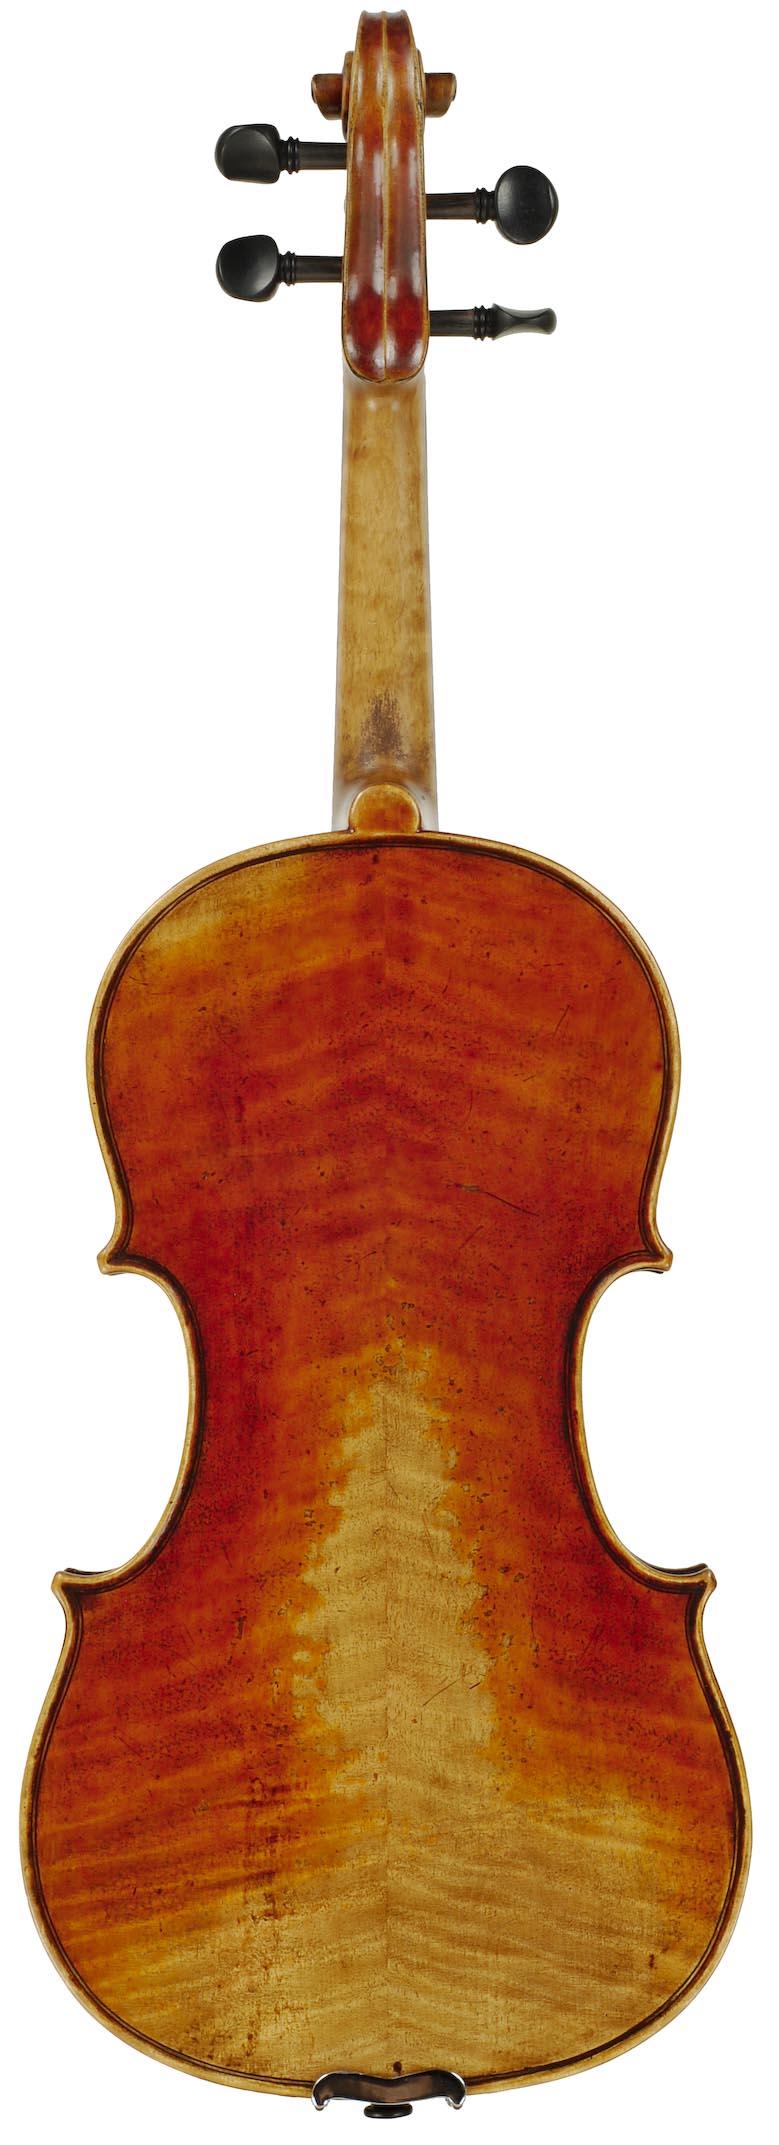 Jay_Haide_violin_back